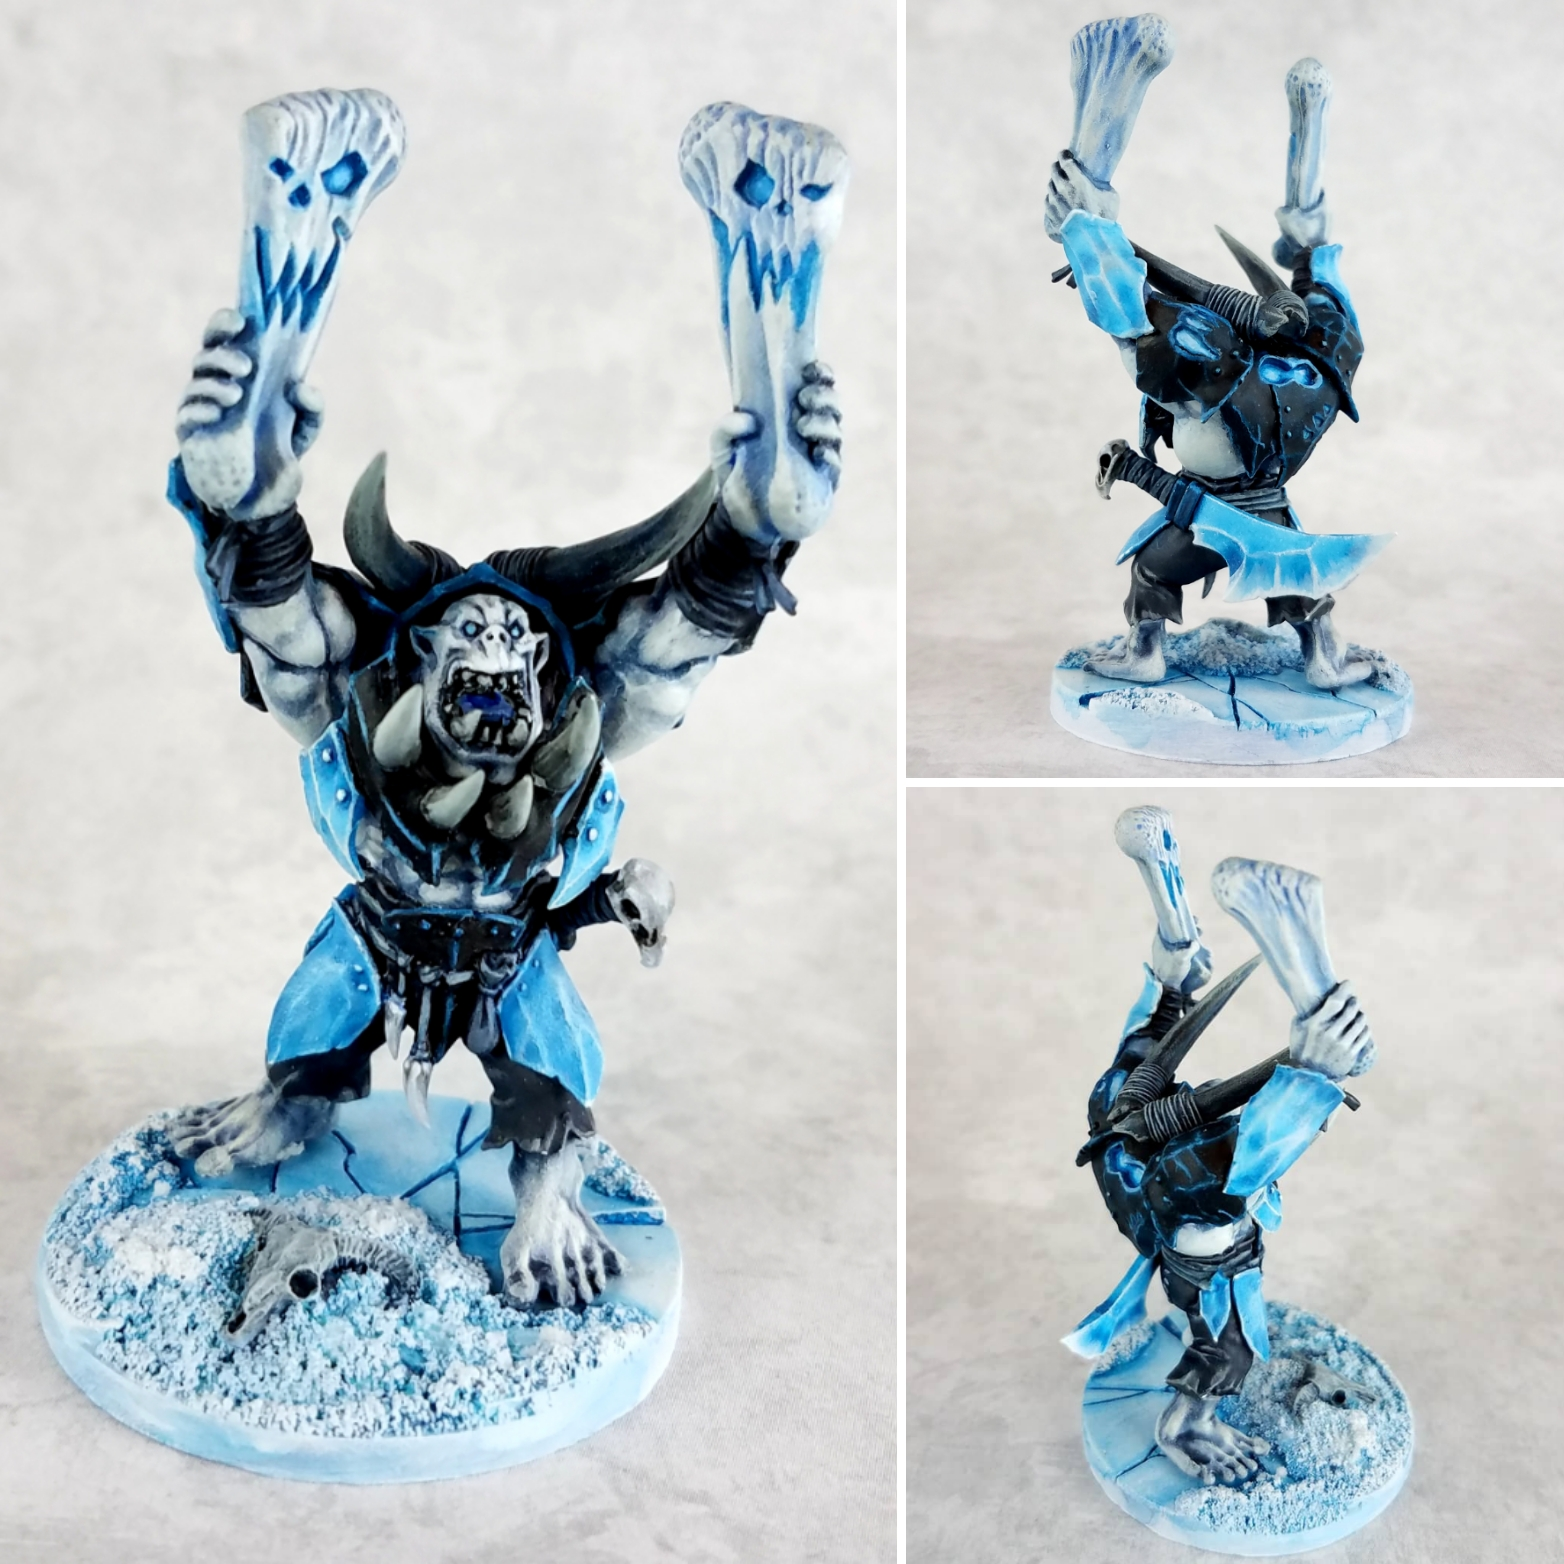 Icejawz Warchanter